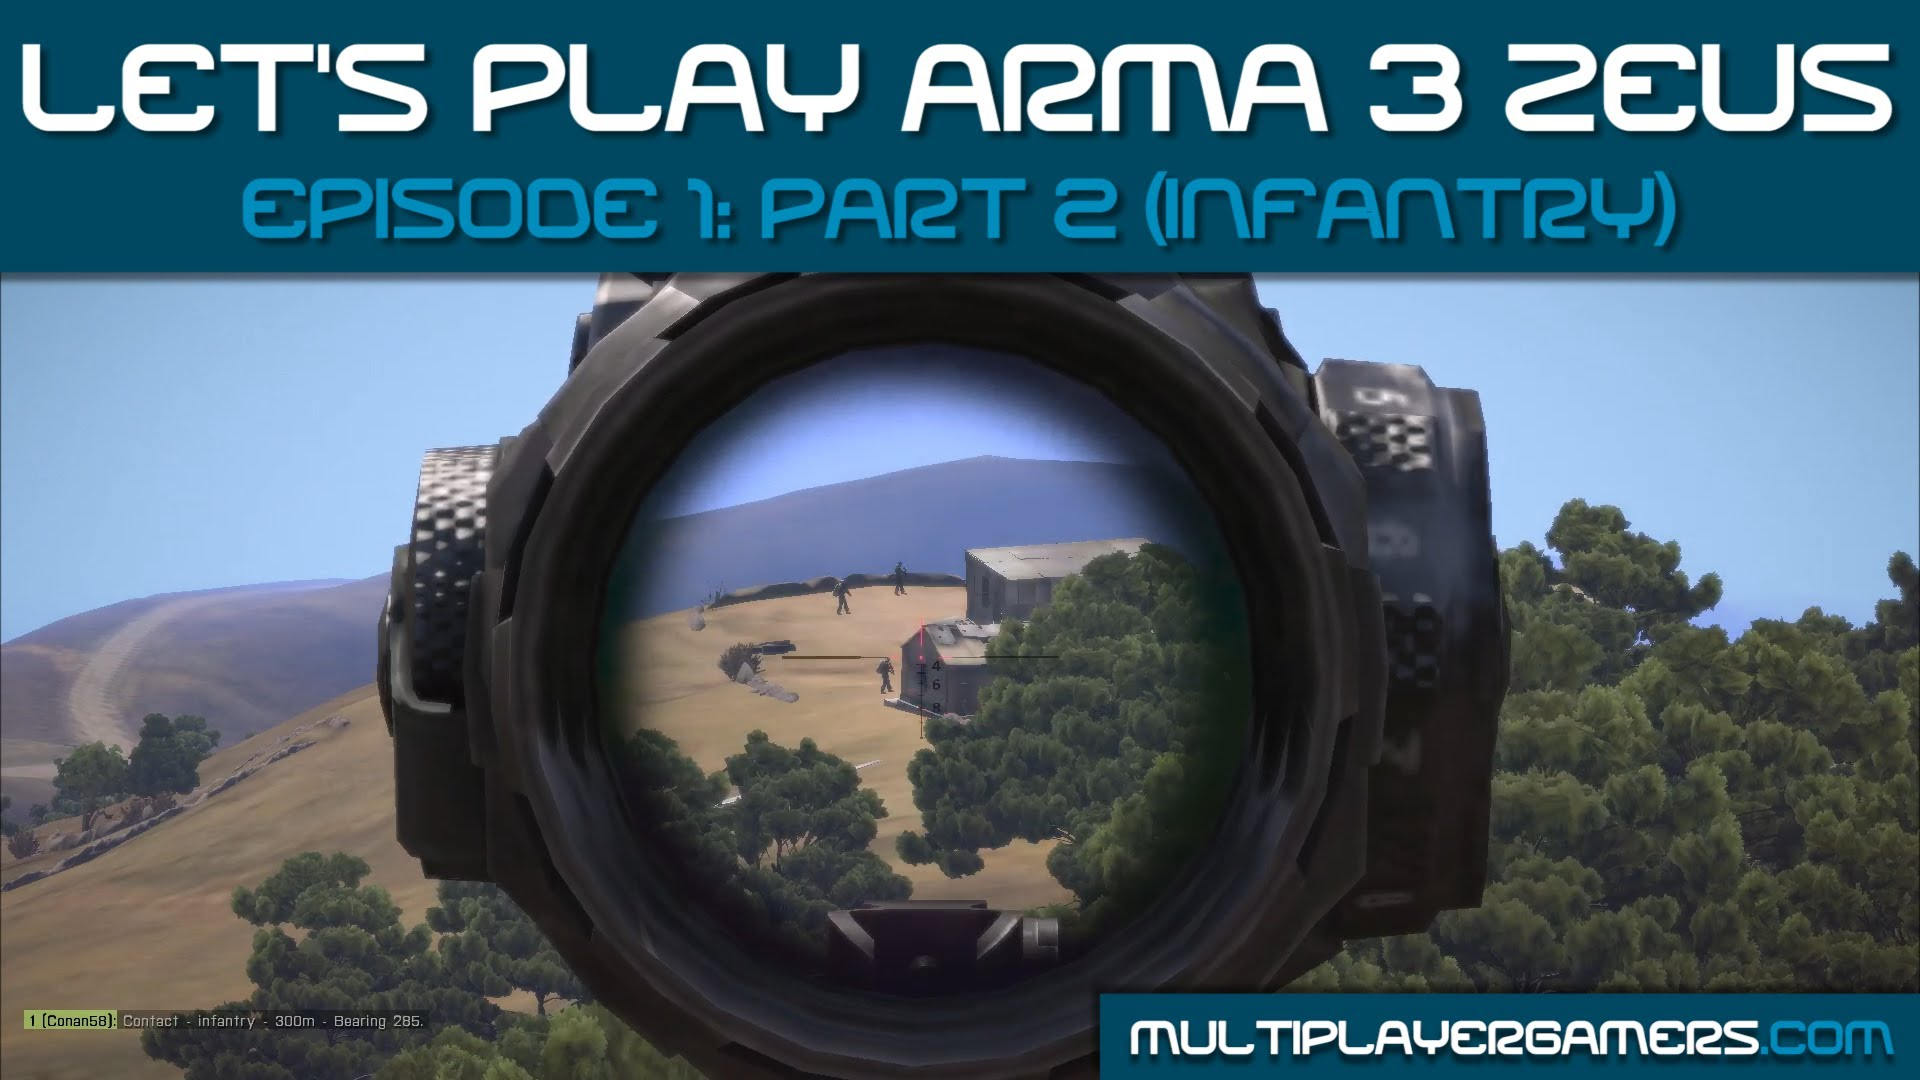 MG's Arma3 Zeus: Ep 1 Pt 2 (Infantry View)